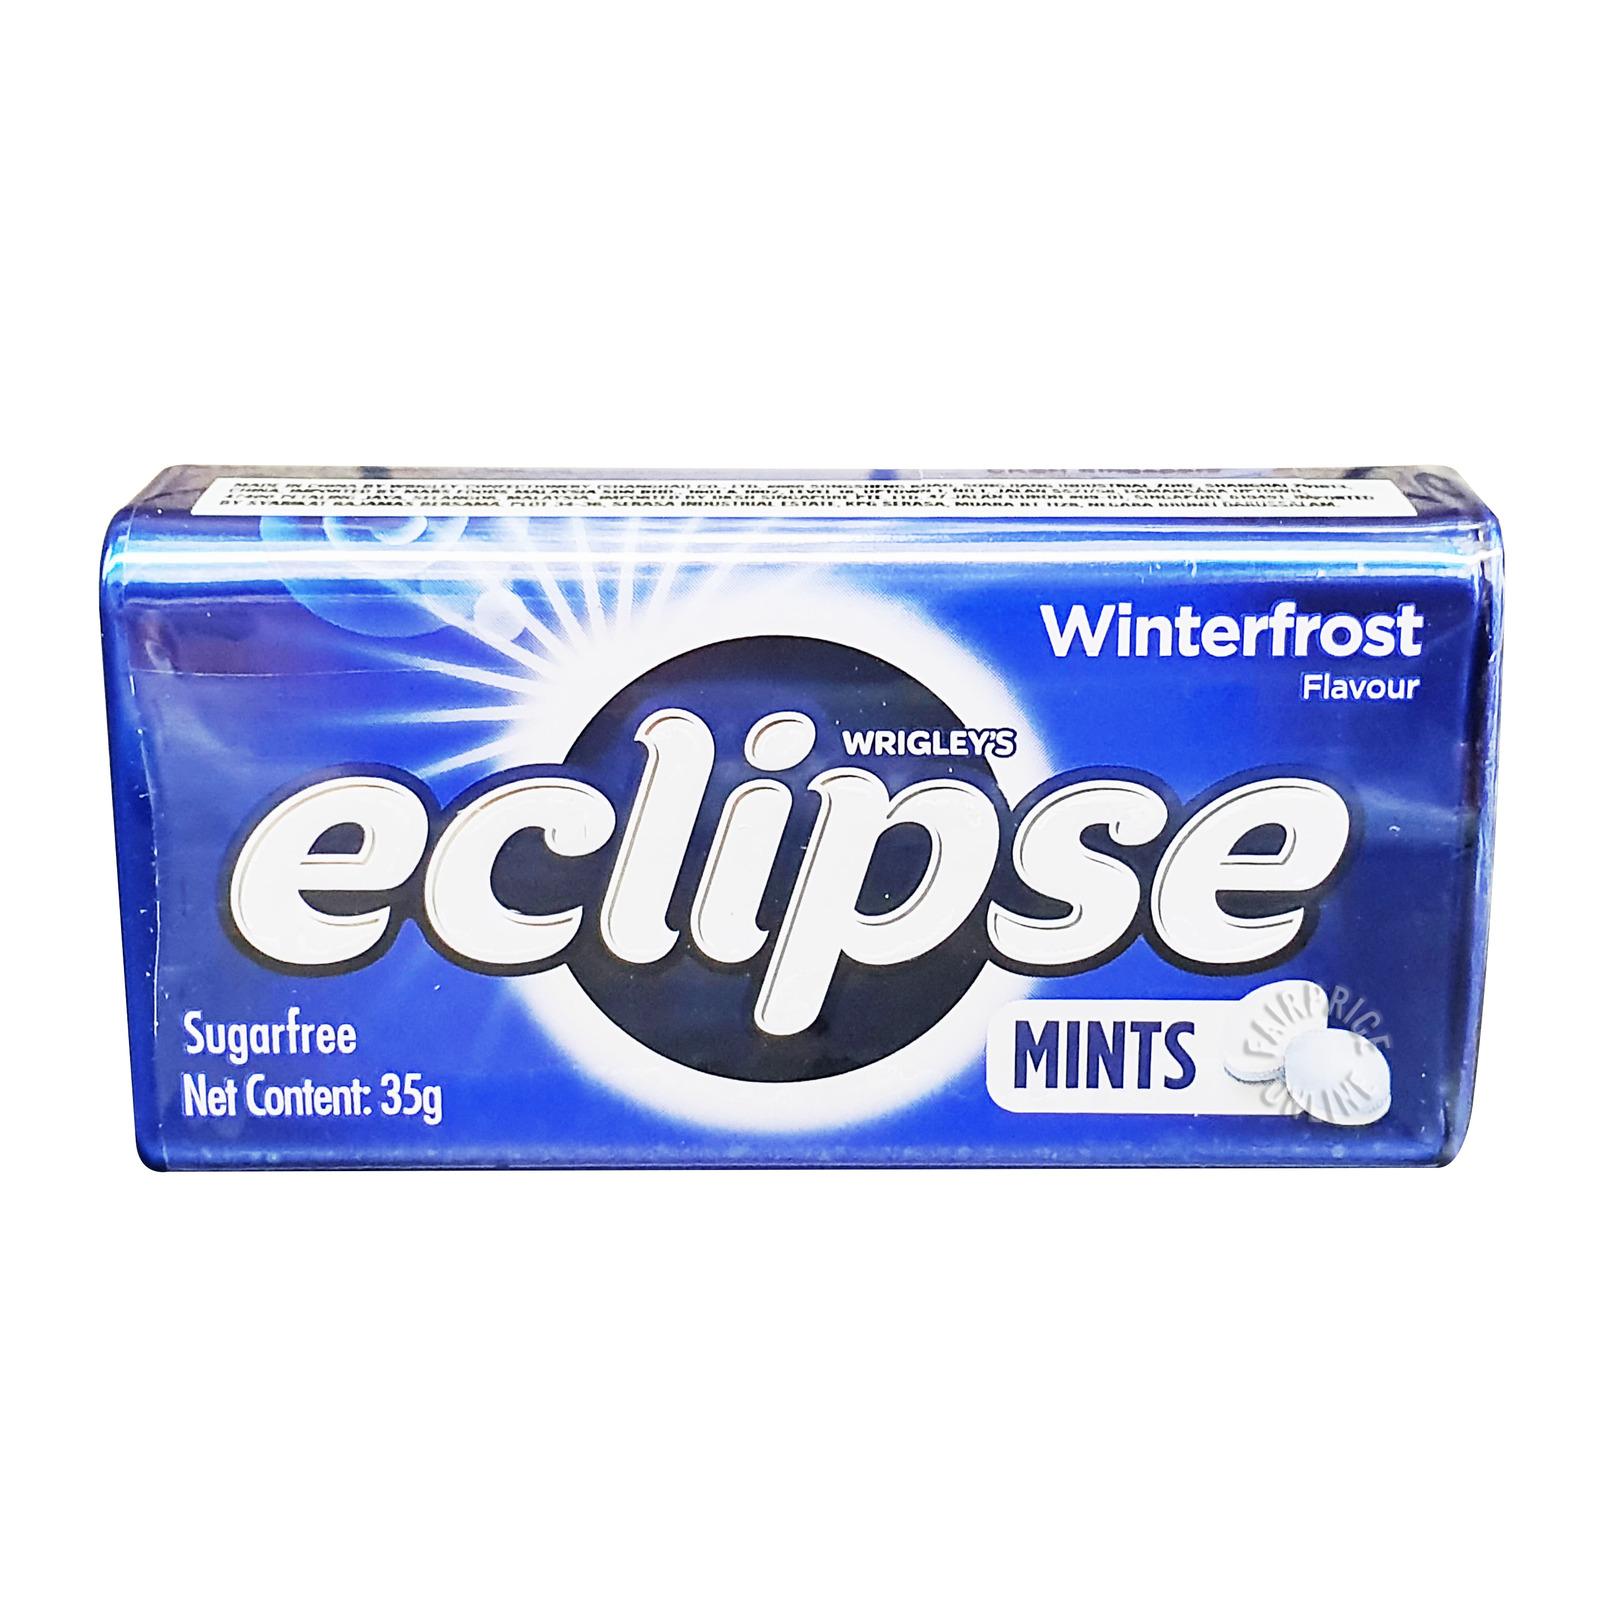 Wrigley's Eclipse Sugar Free Mints Candy - Winterfrost